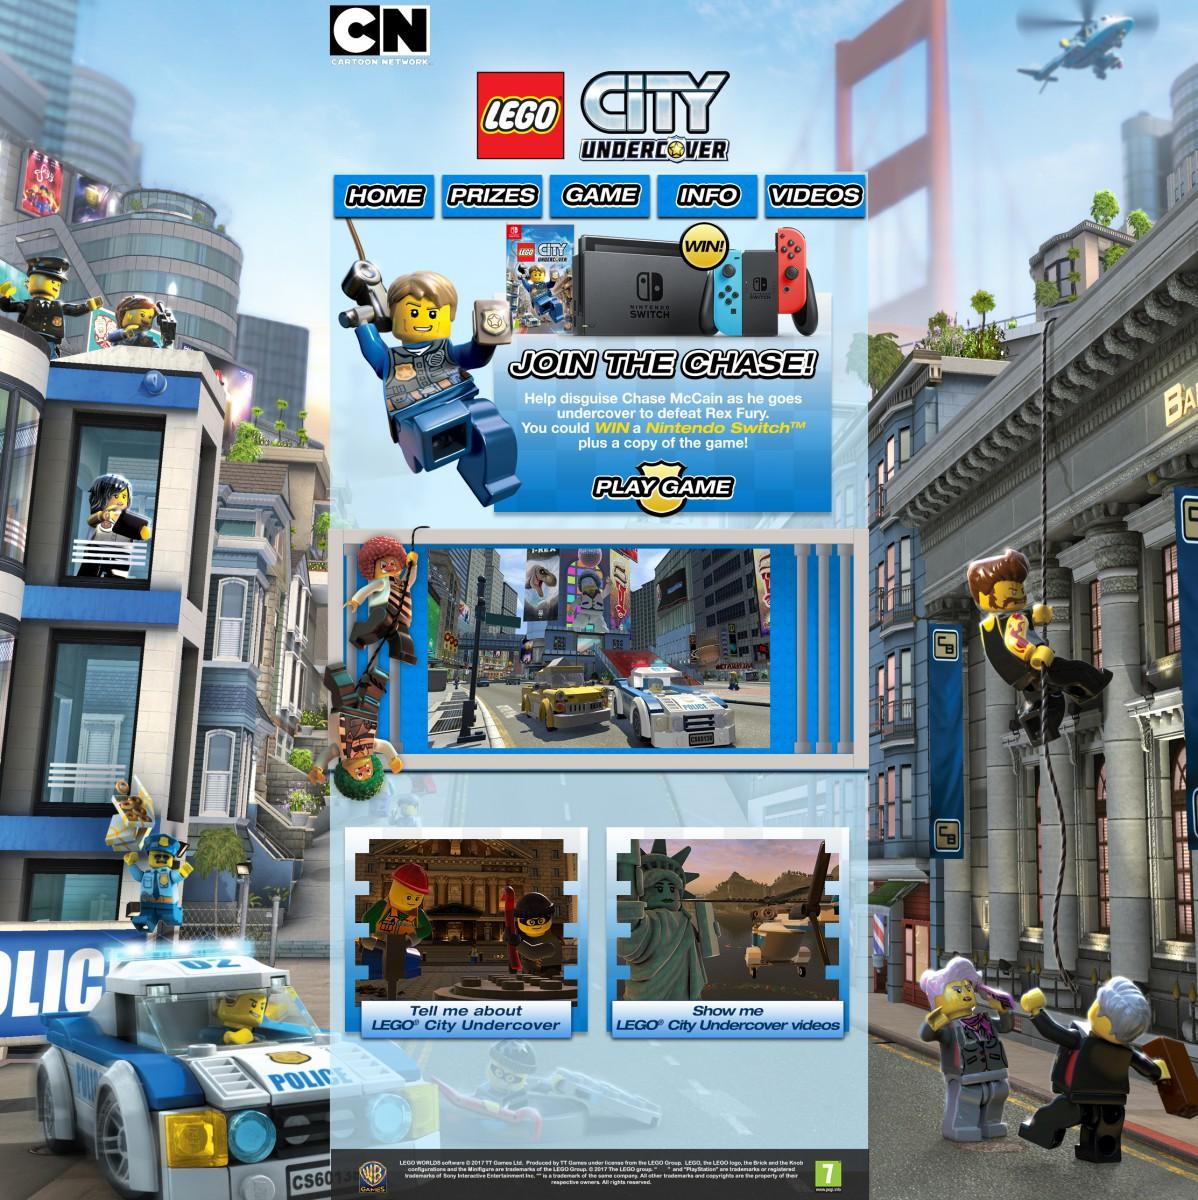 Tempat Jual Build A Lego City Diy Terbaru 2018 Steam P 105 Cm T 15 Balap Alloy Standart 254 Insert 222 Undercover Otmentertain